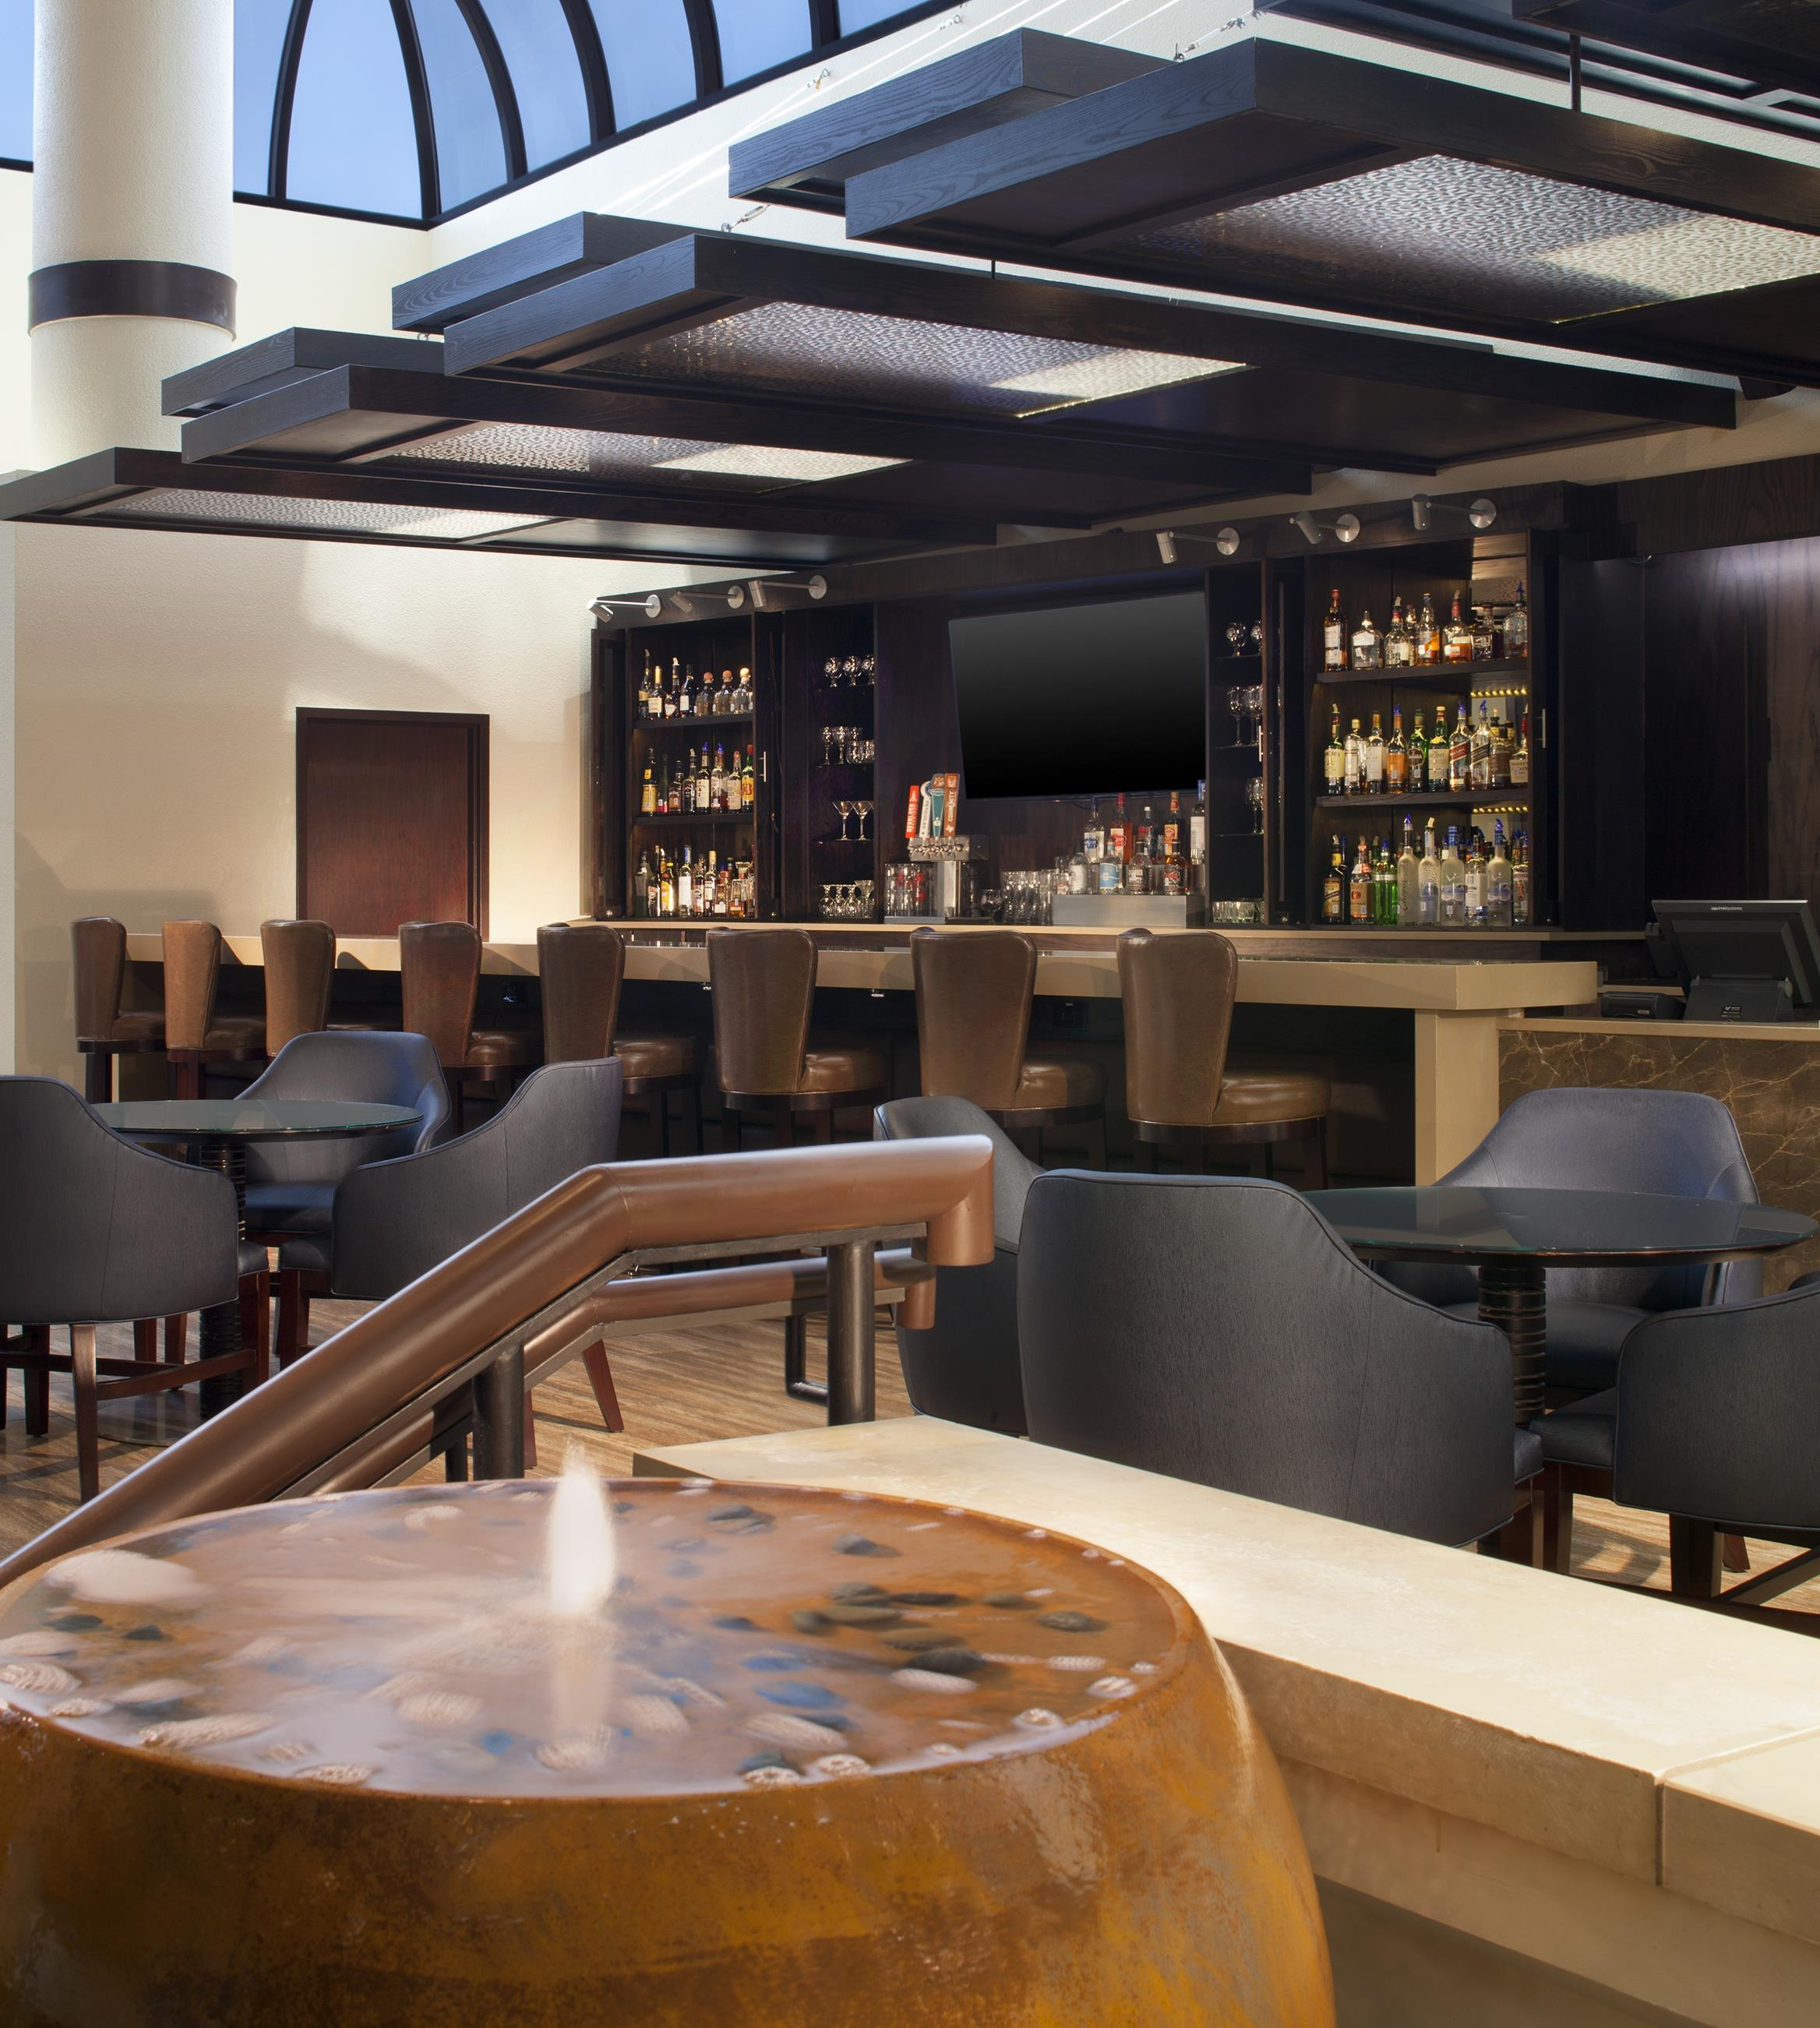 sheraton dfw airport hotel irving texas tx. Black Bedroom Furniture Sets. Home Design Ideas